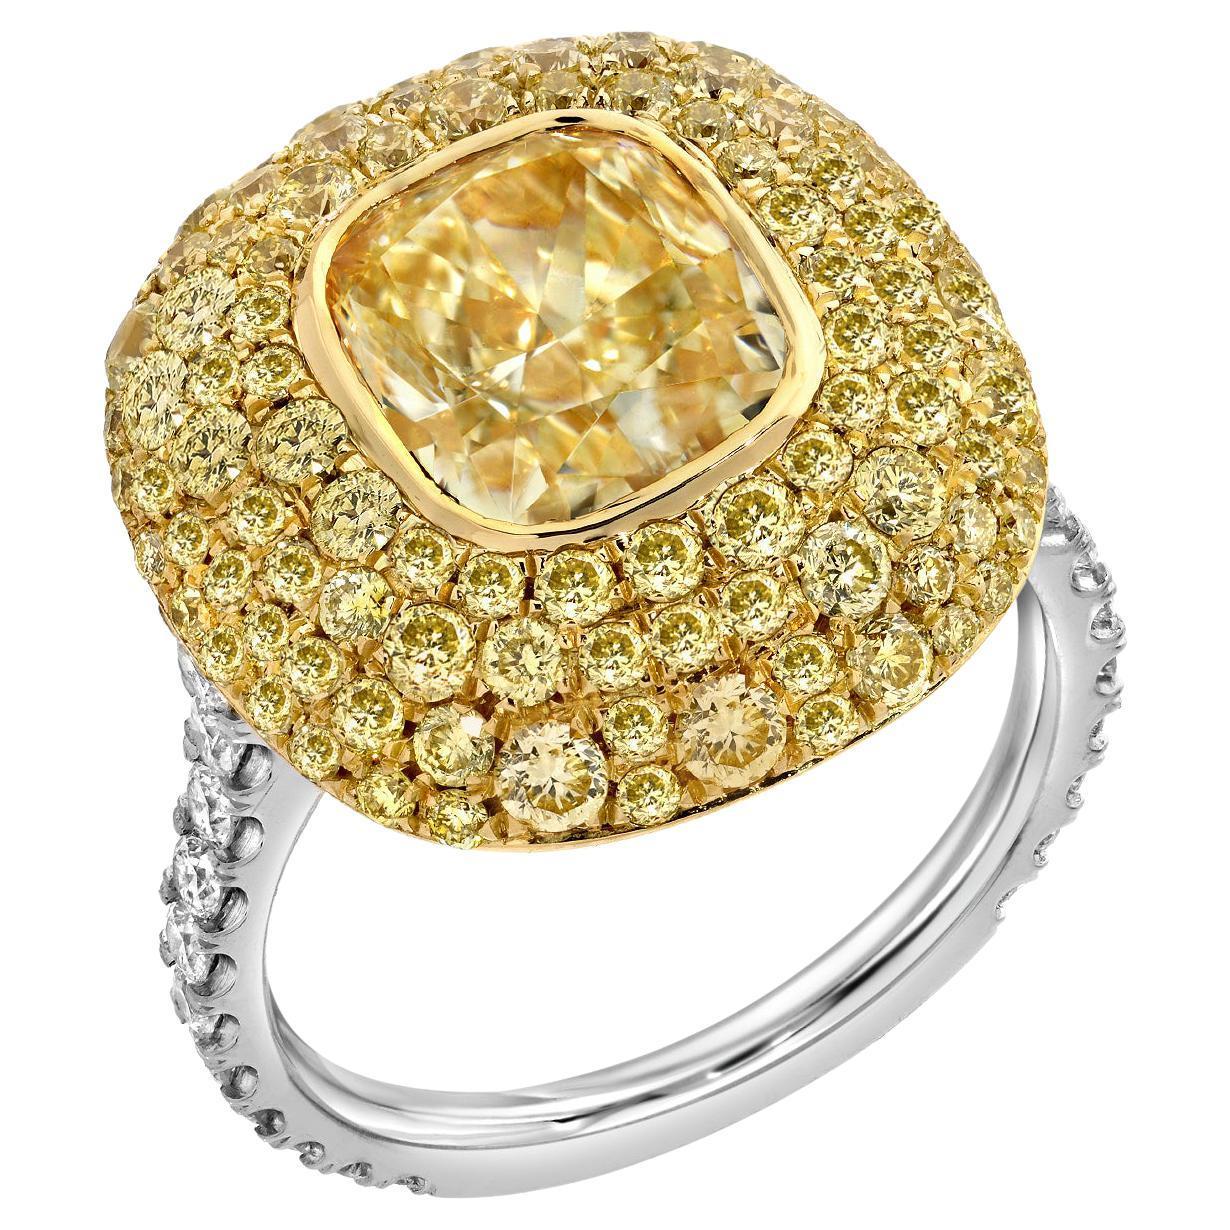 Fancy Light Yellow Diamond Ring 3.01 Carat GIA Certified